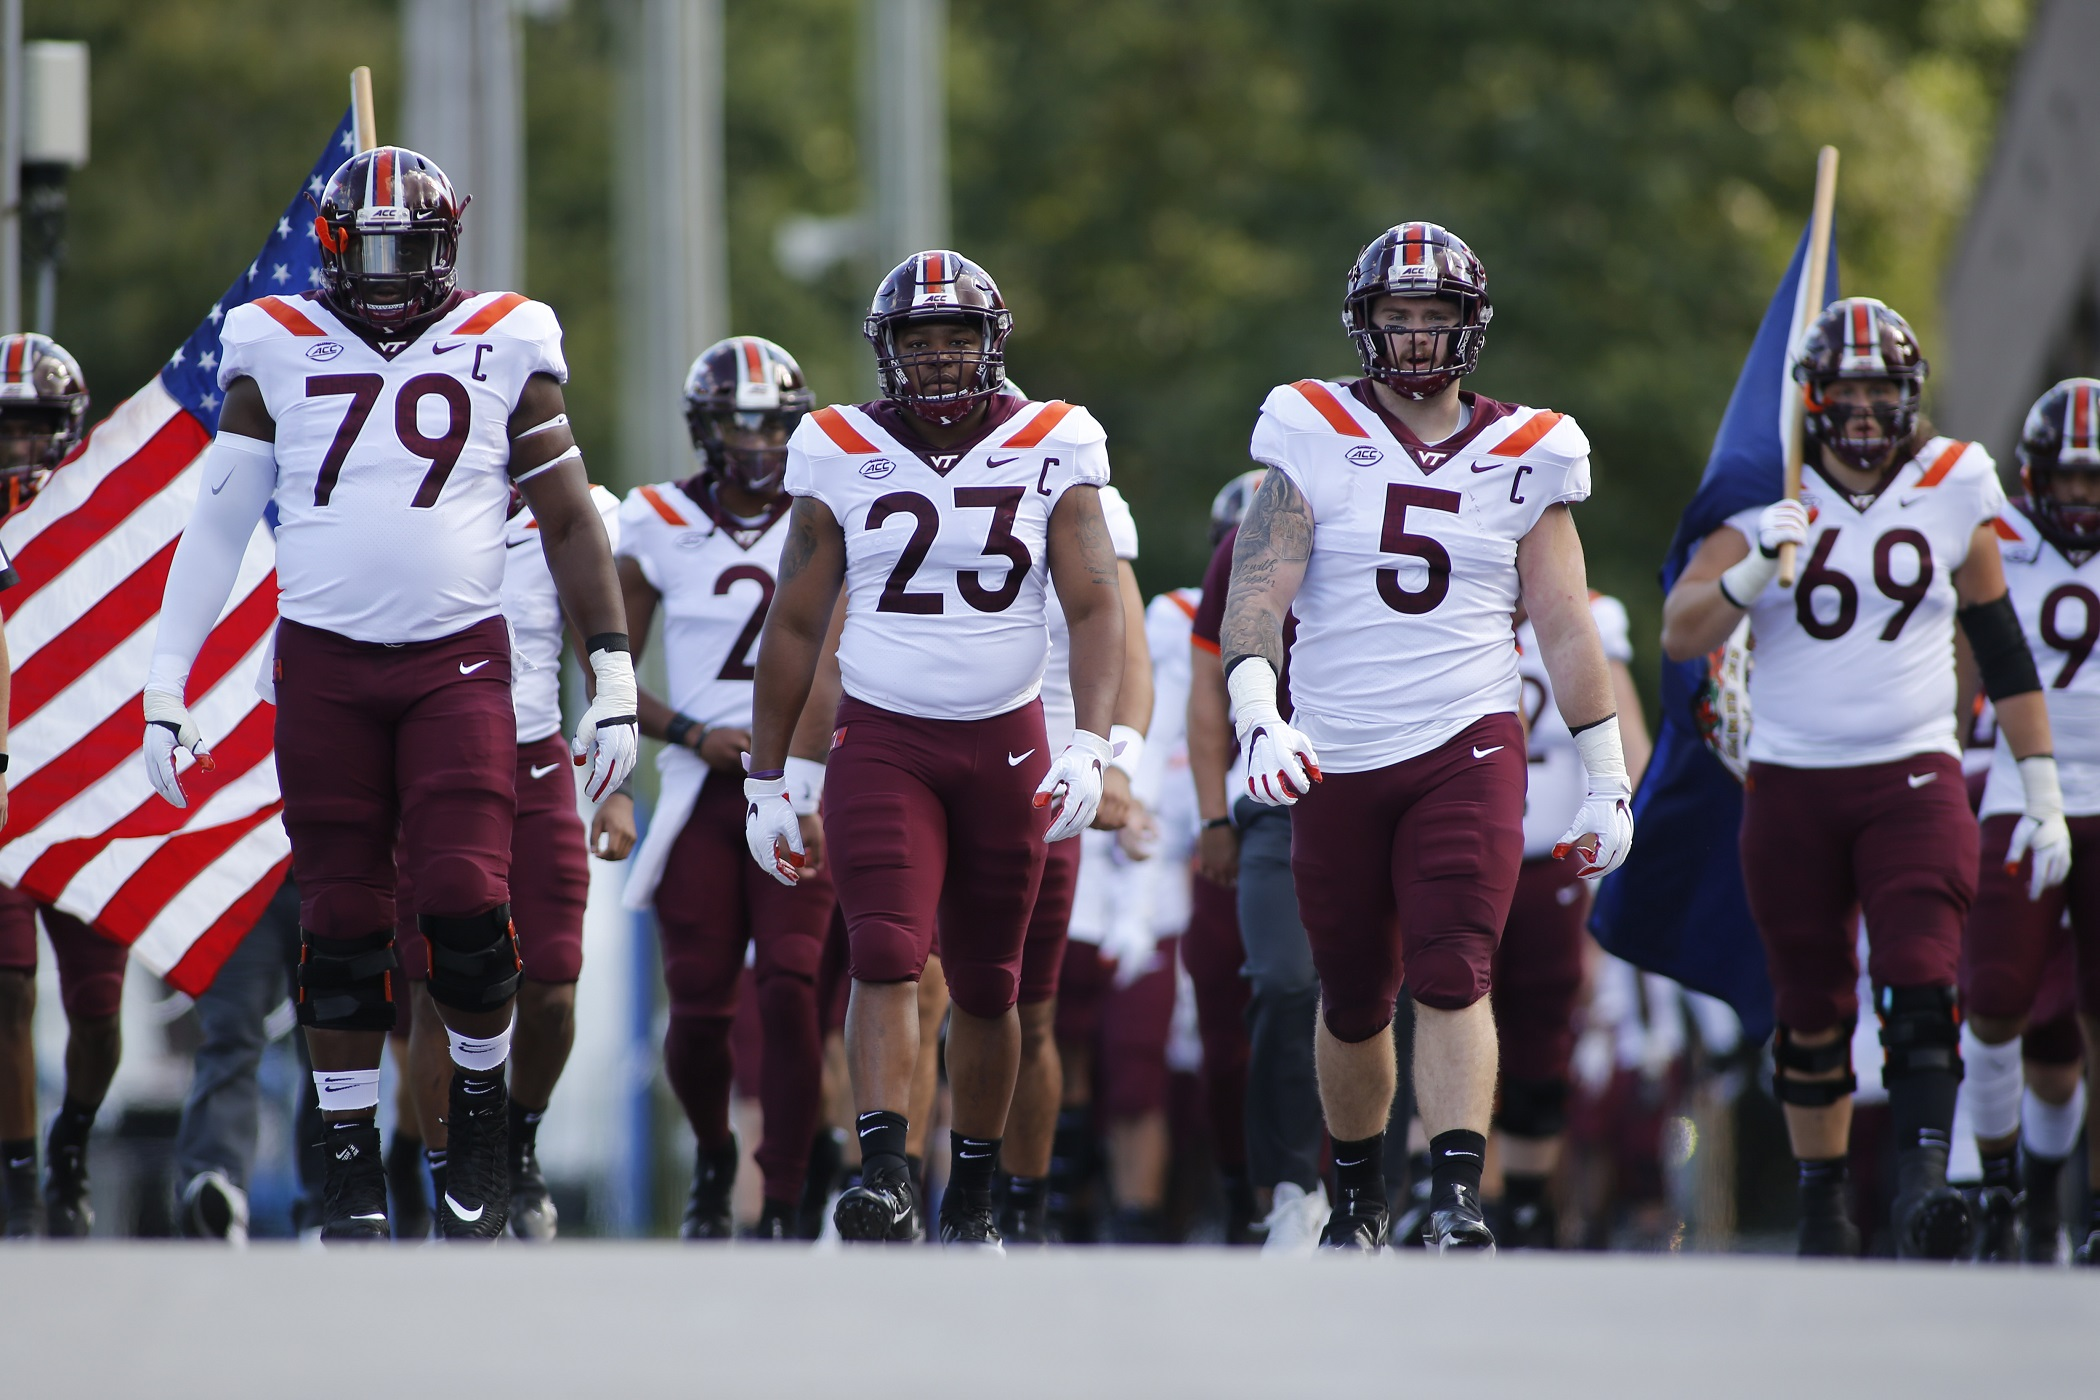 Virginia Tech Duke 2020